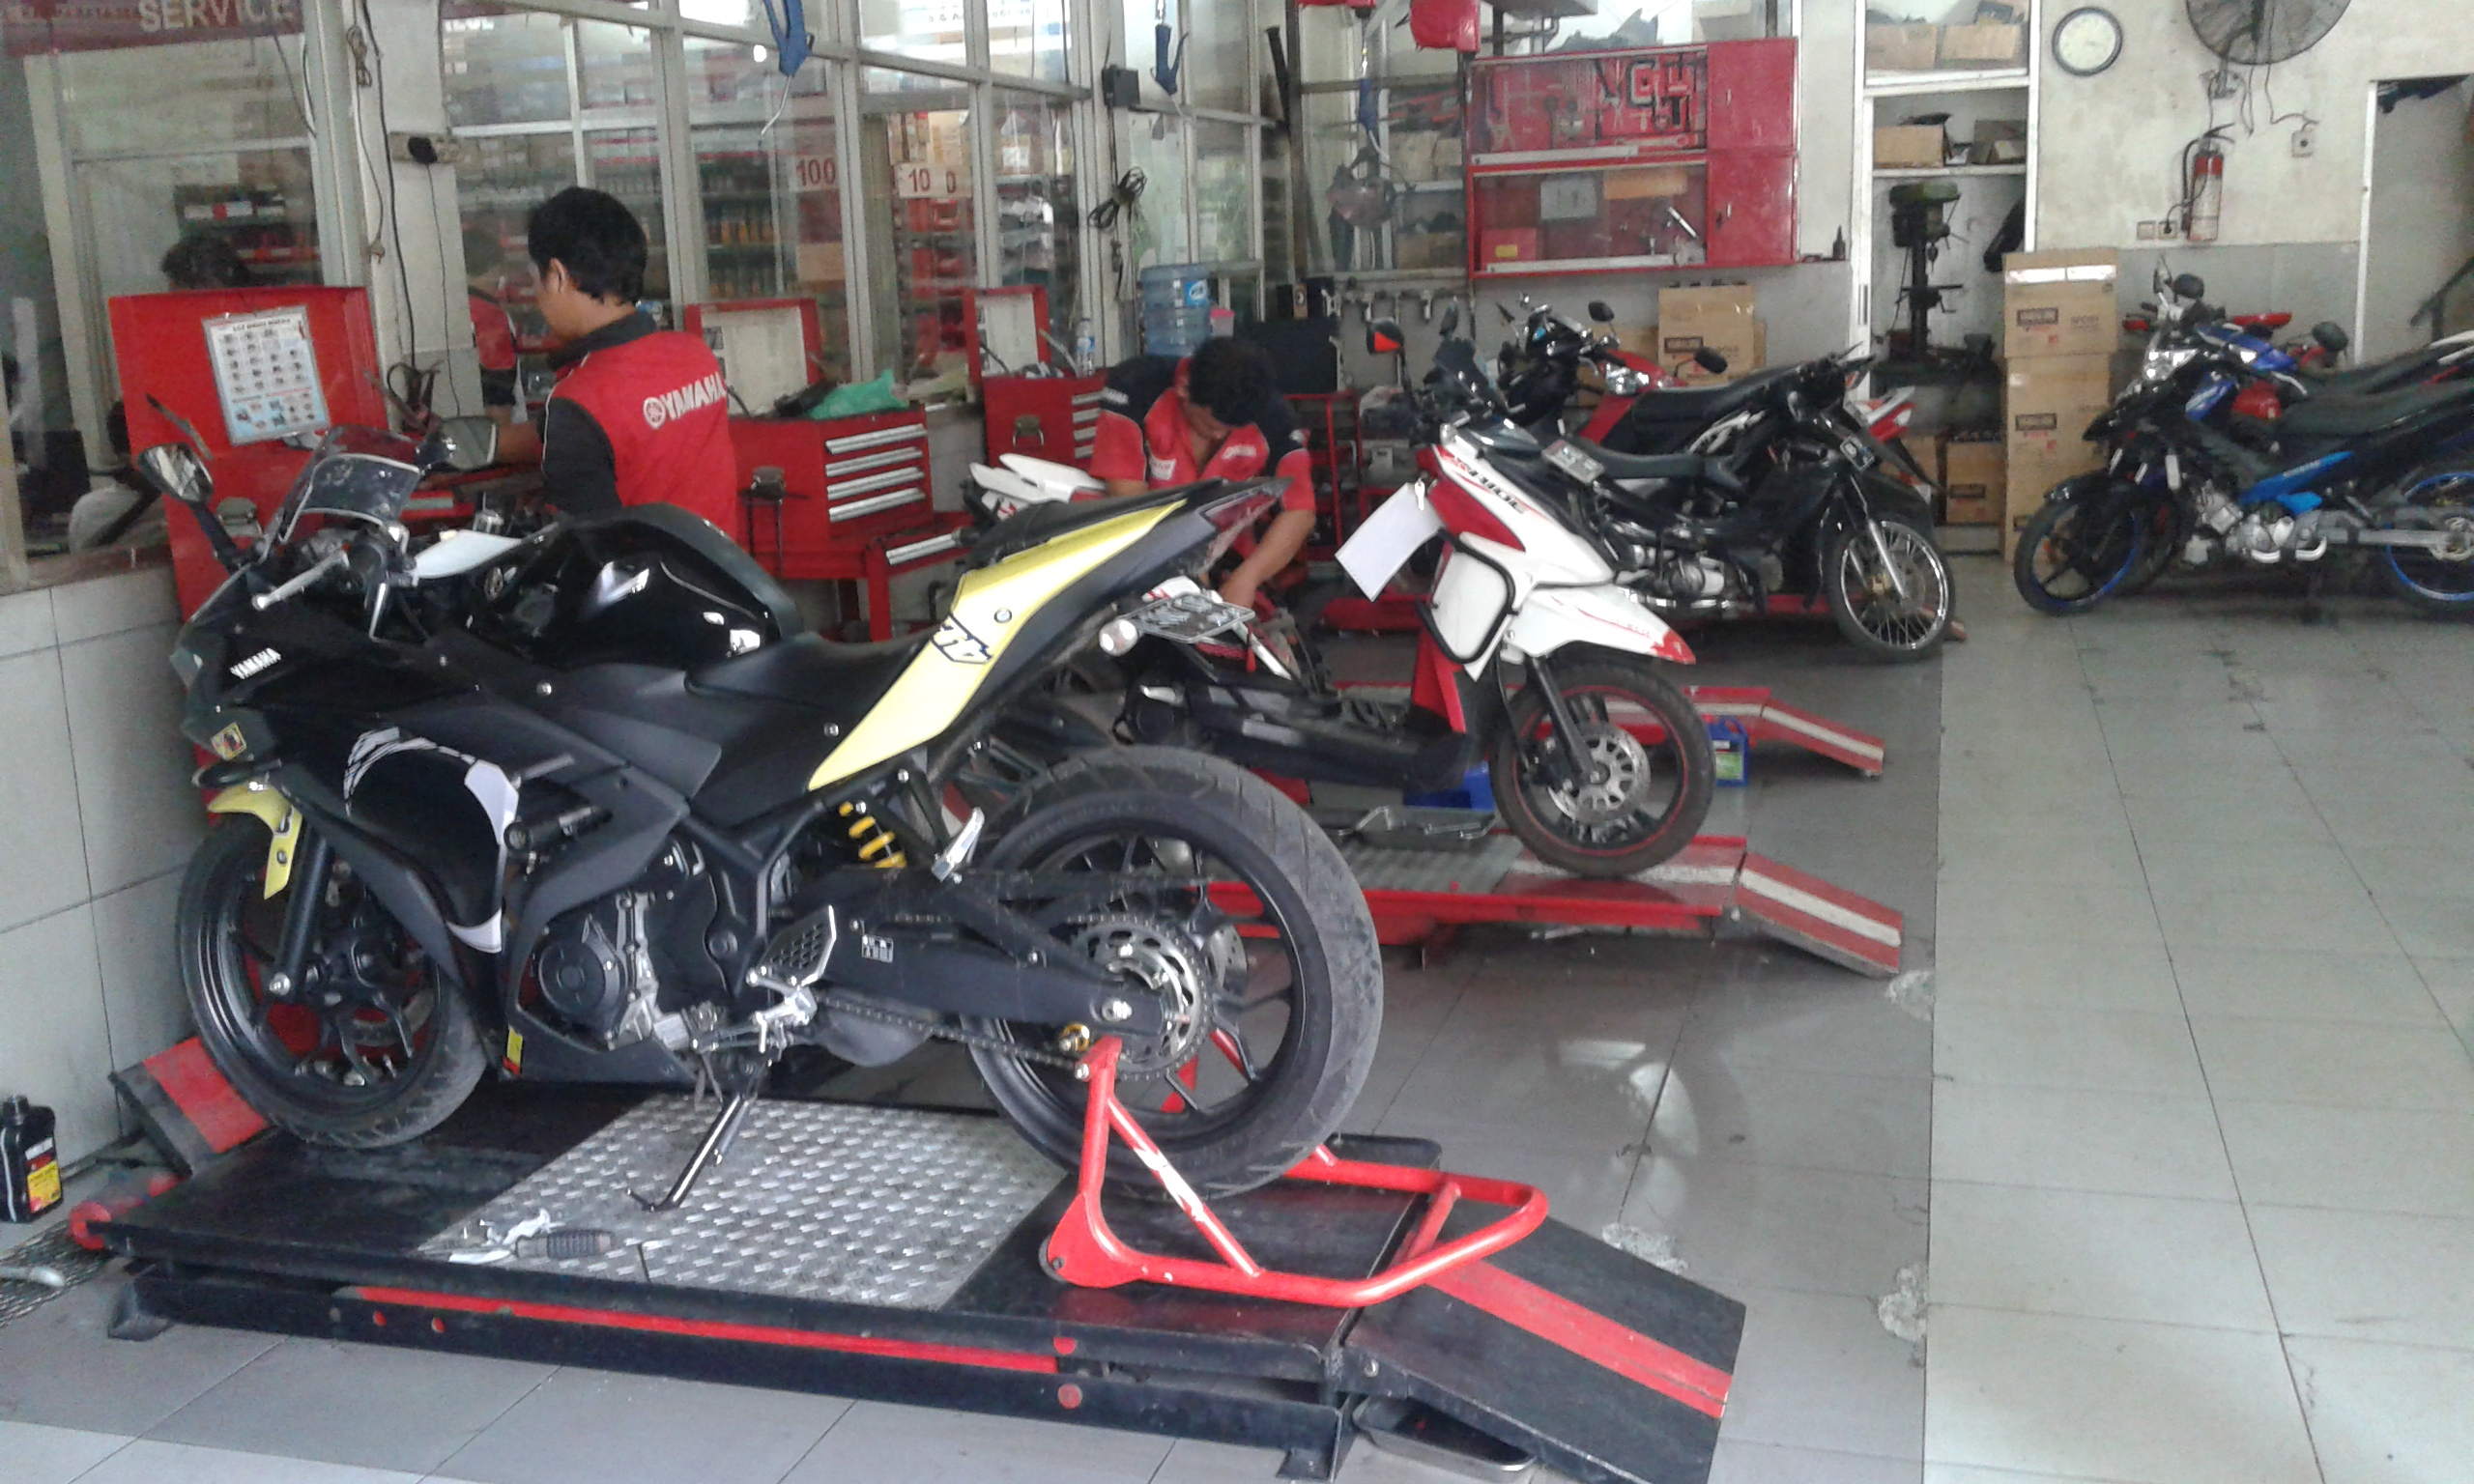 yamaha moped. yamaha mustika motor adalah dealer sekaligus bengkel resmi yamaha, dengan peralatan yang lengkap dan memiliki mekanik handal. moped